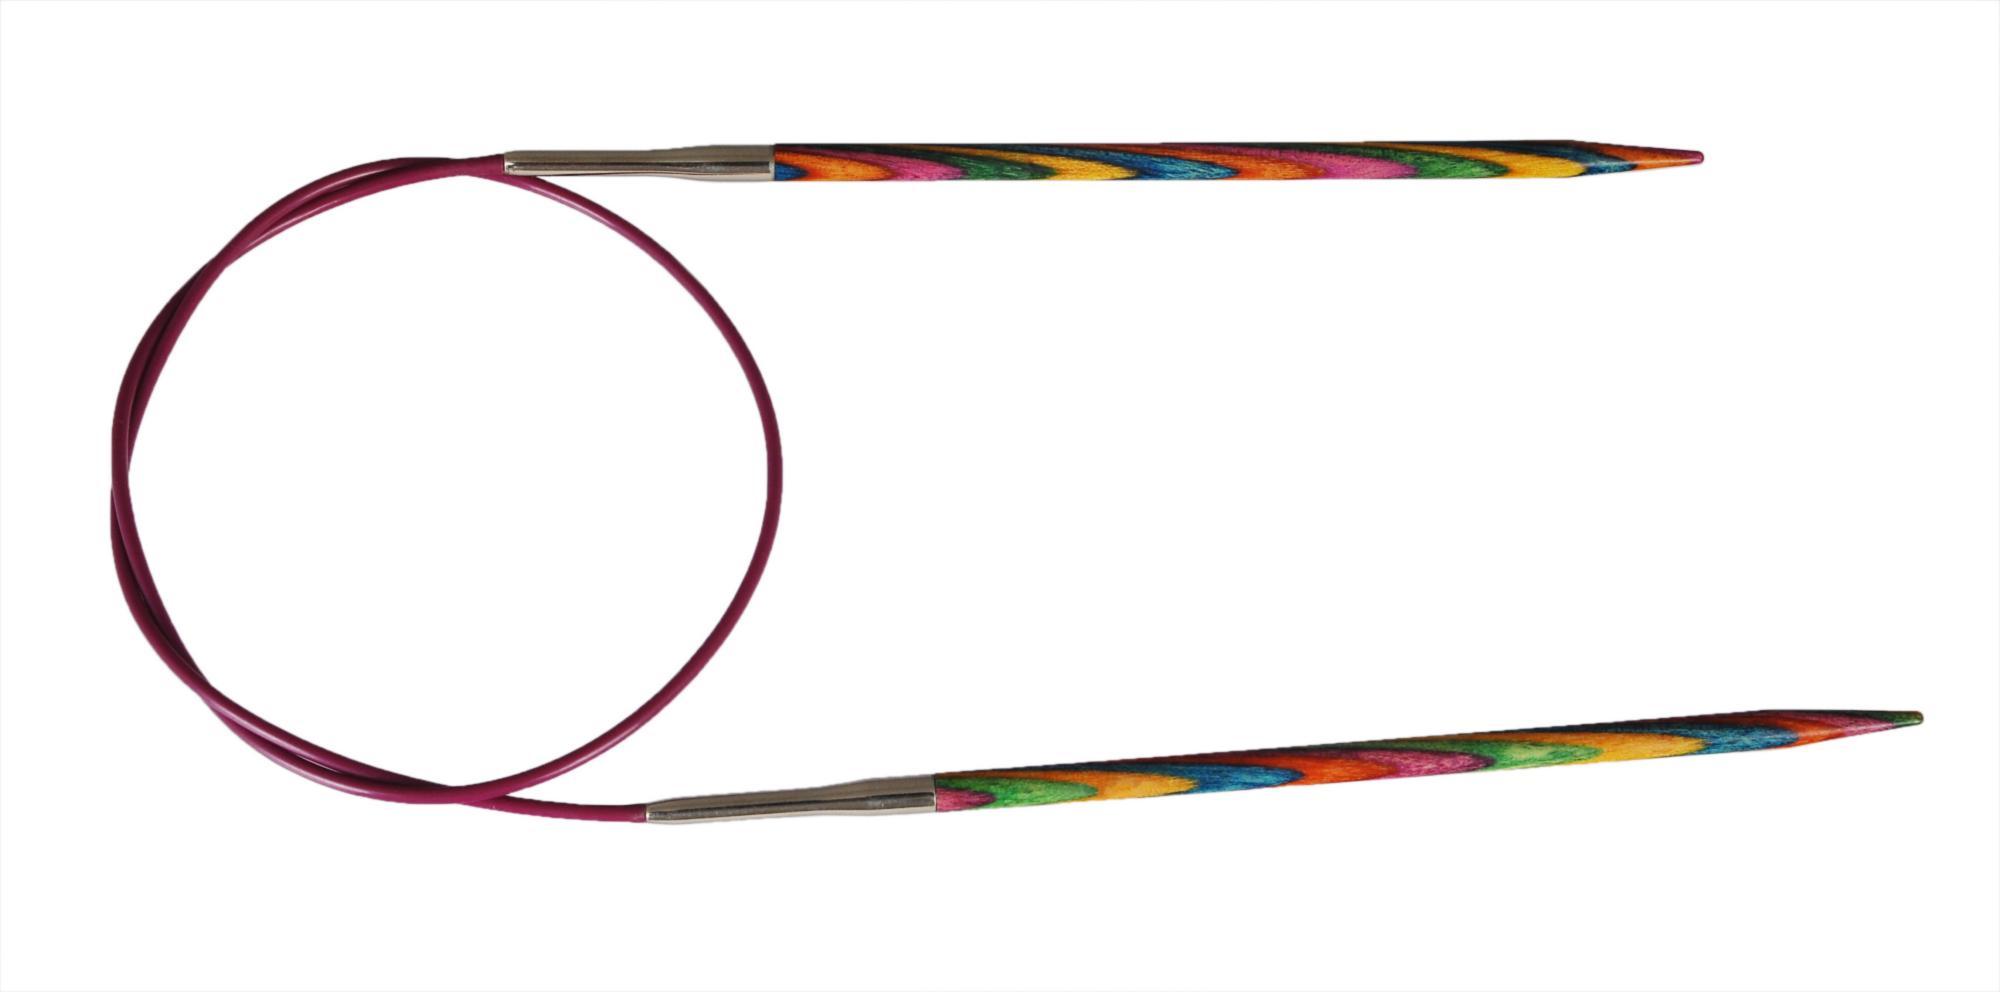 Спицы круговые 50 см Symfonie Wood KnitPro, 20388, 3.75 мм